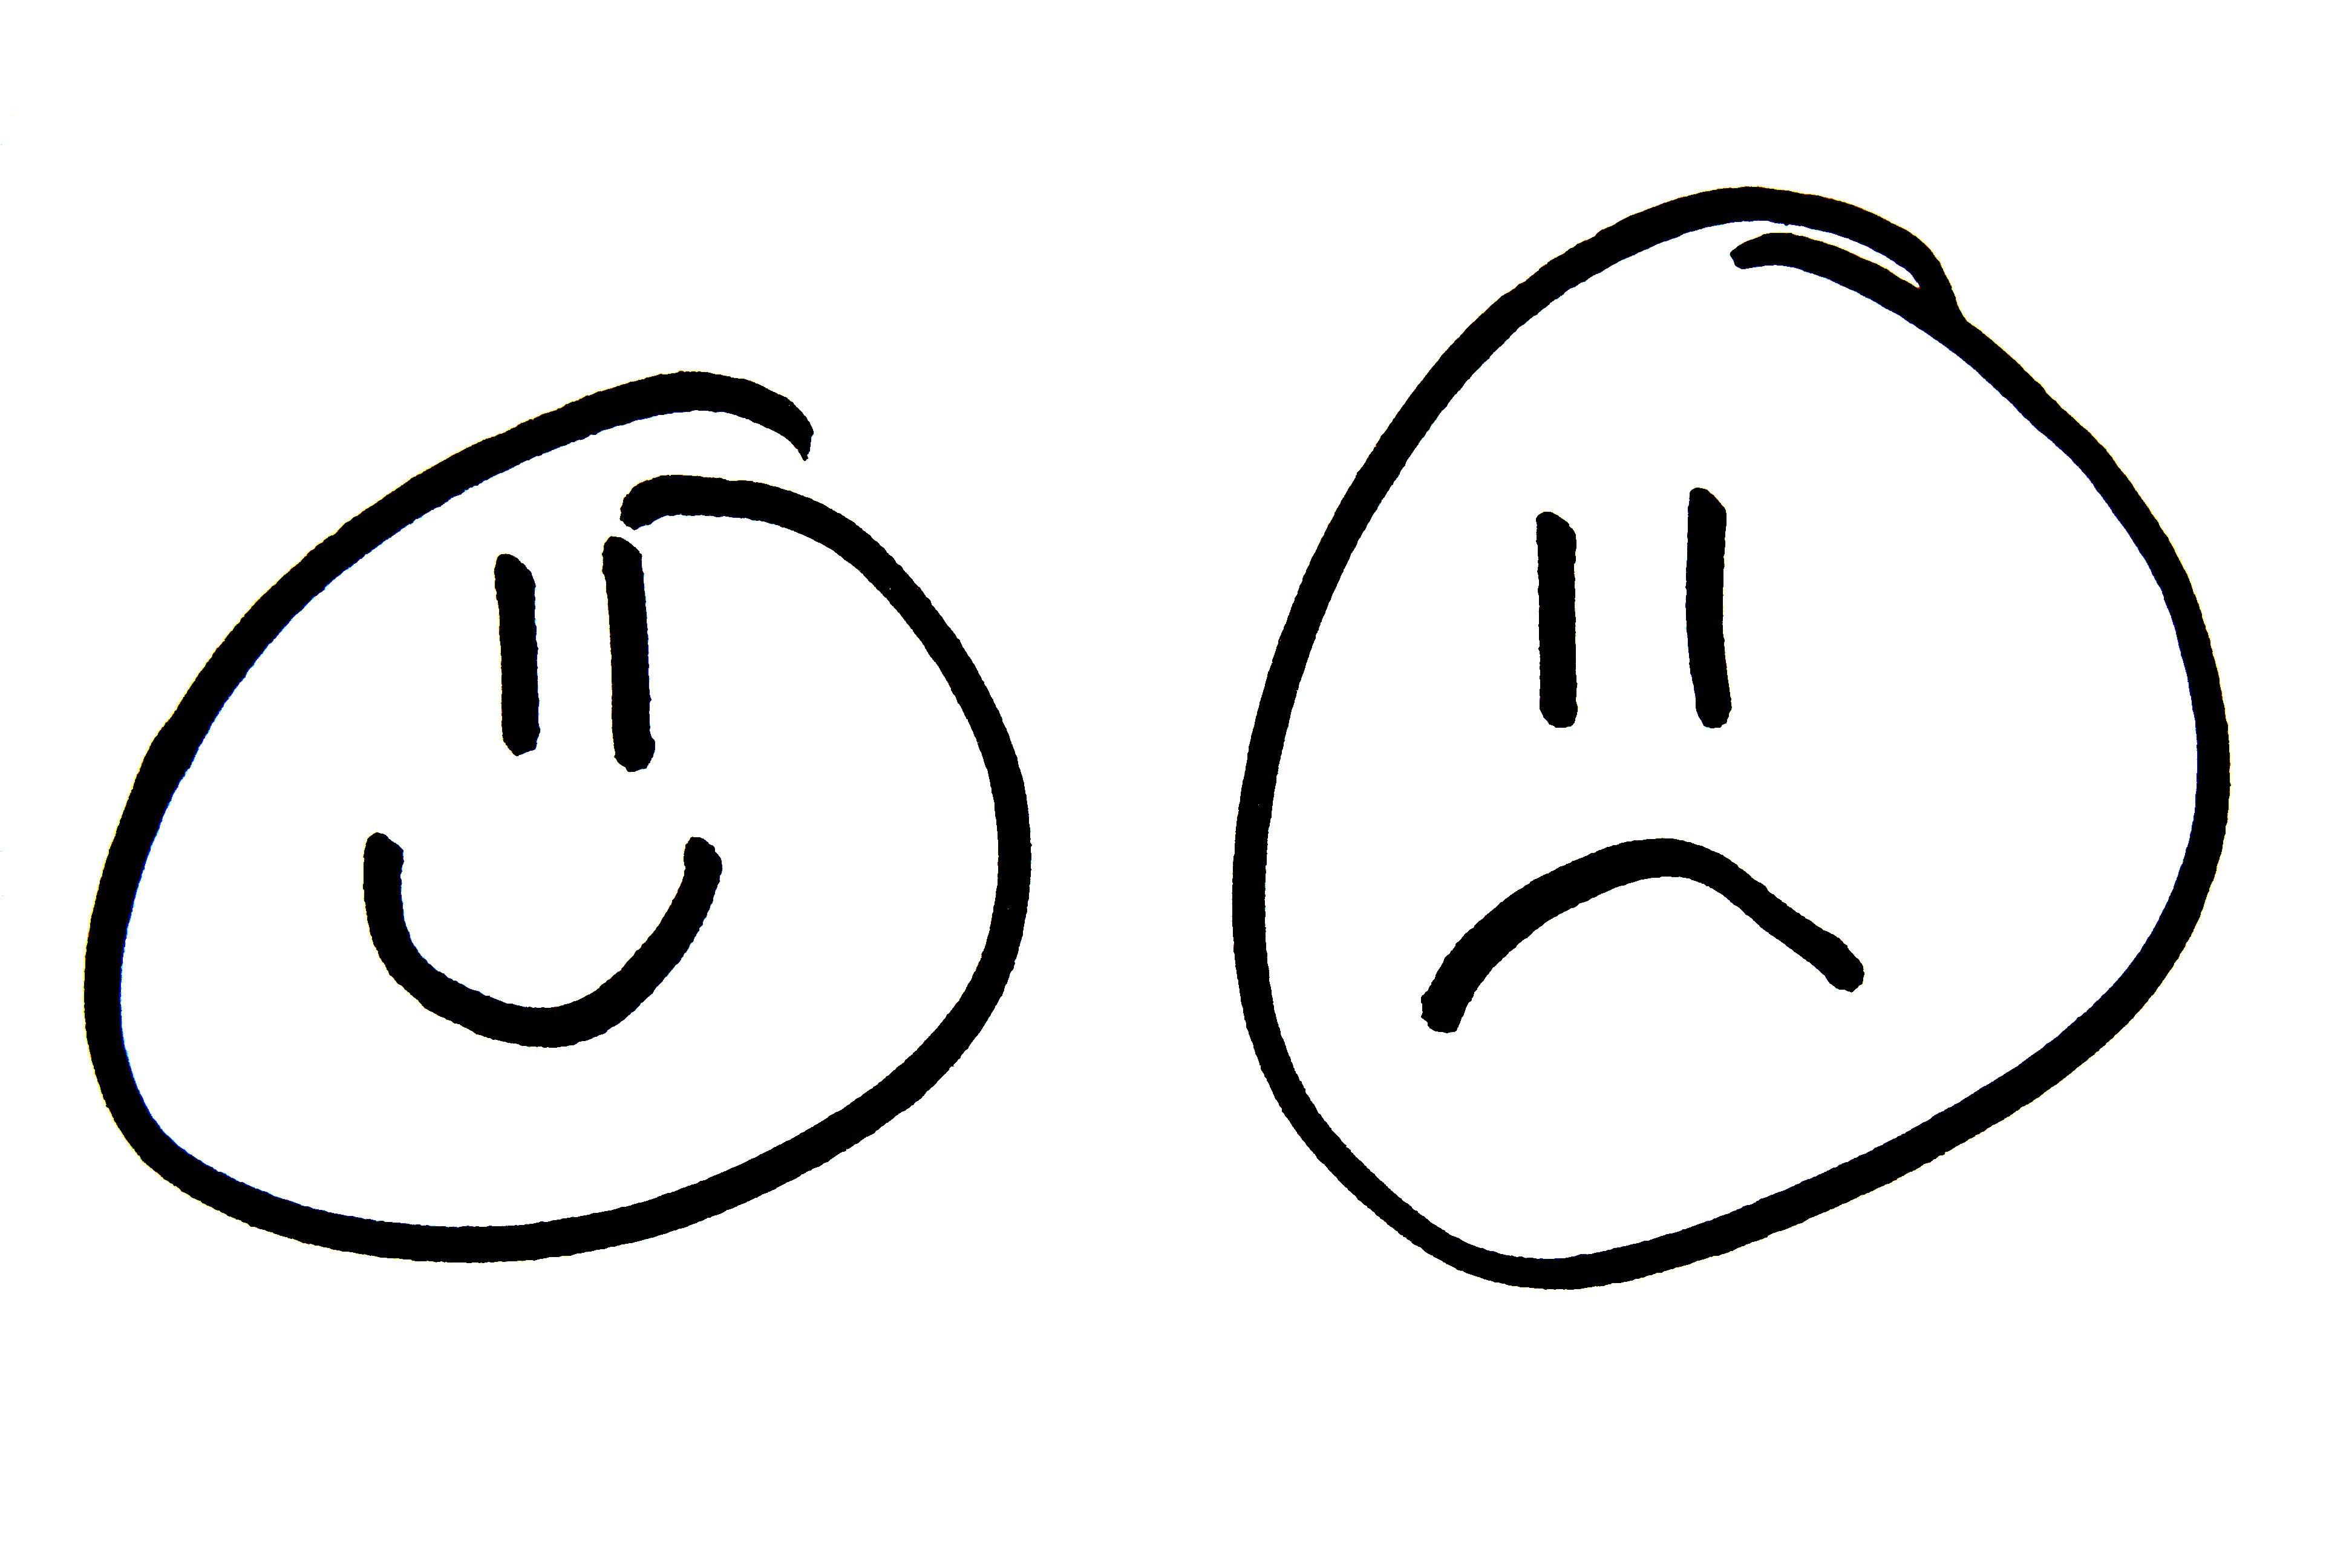 3888x2592 Sad Face Clip Art Image 2 Clipartix 2